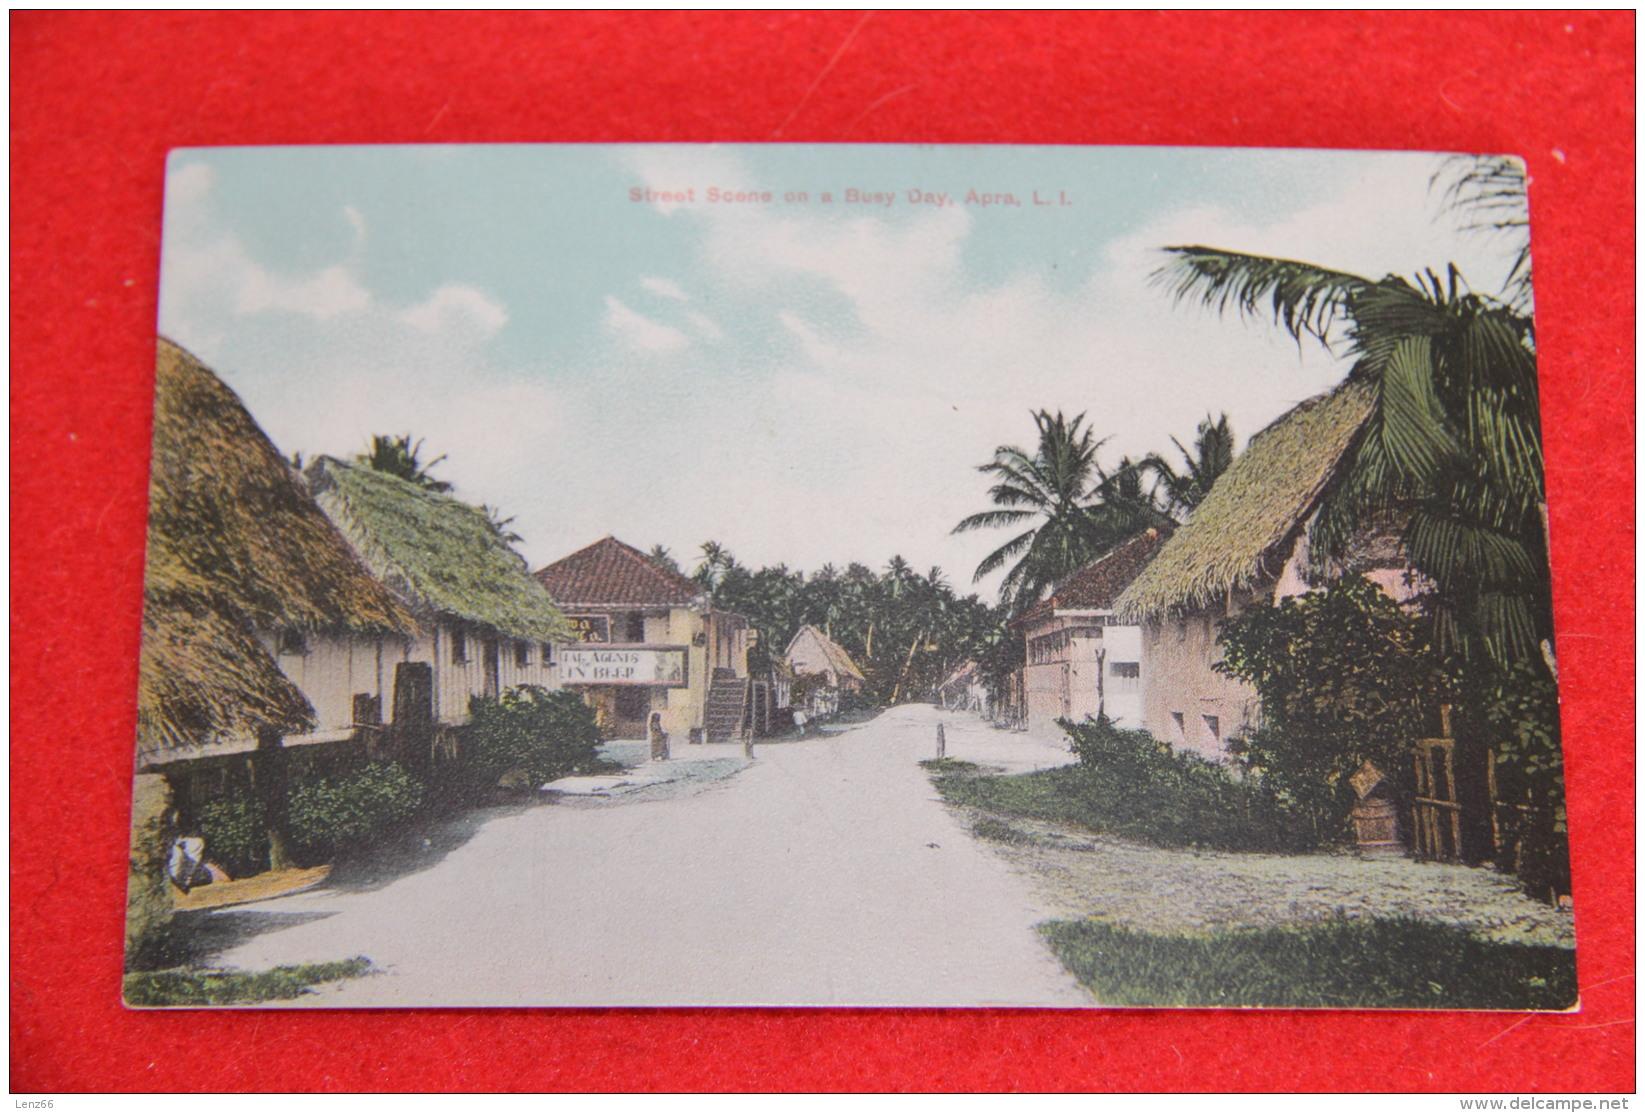 Oceania Guam Apra Street Scene On The Busy Day  1911 - Guam